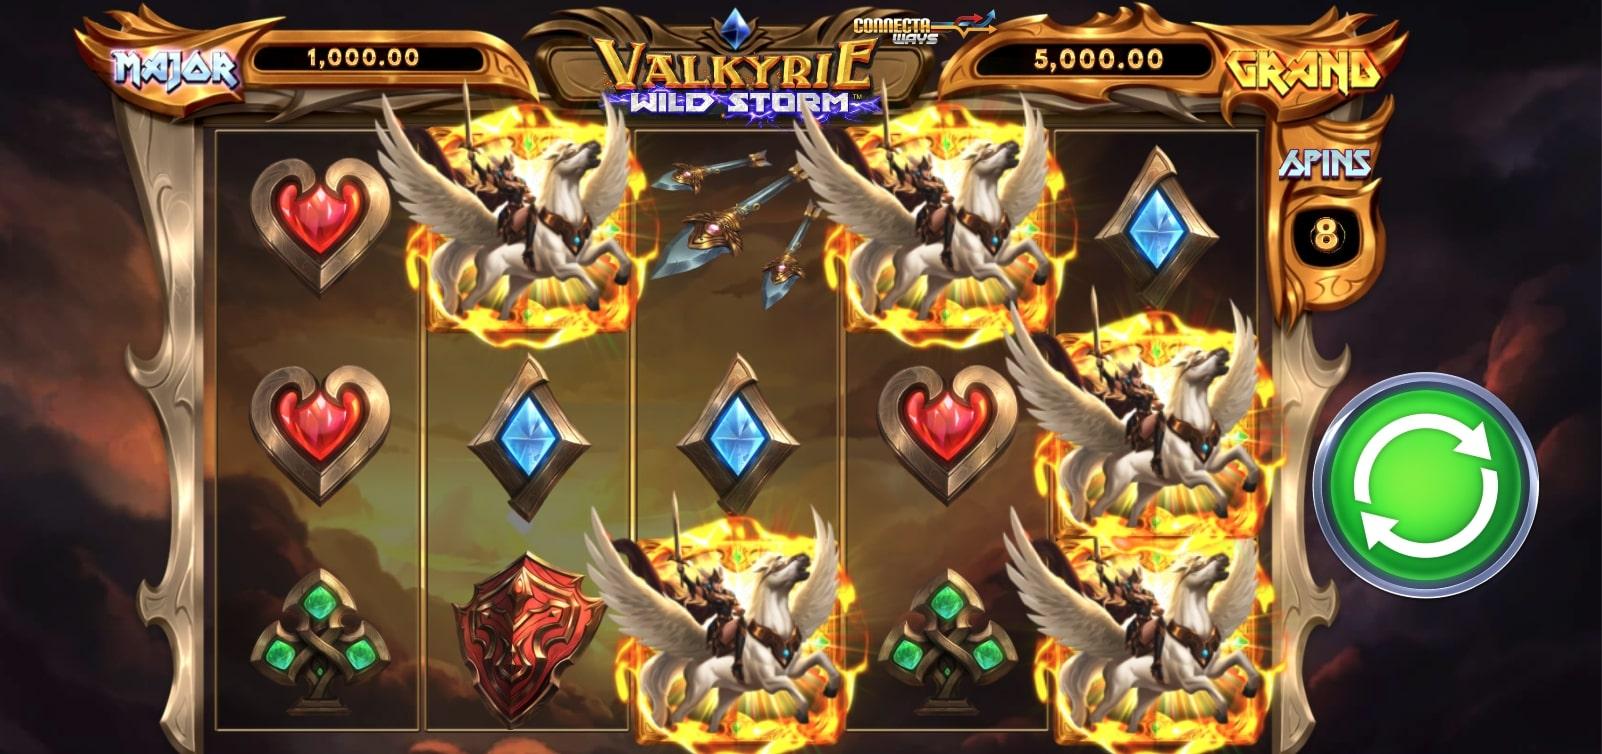 Valkyrie Wild Storm Screenshot